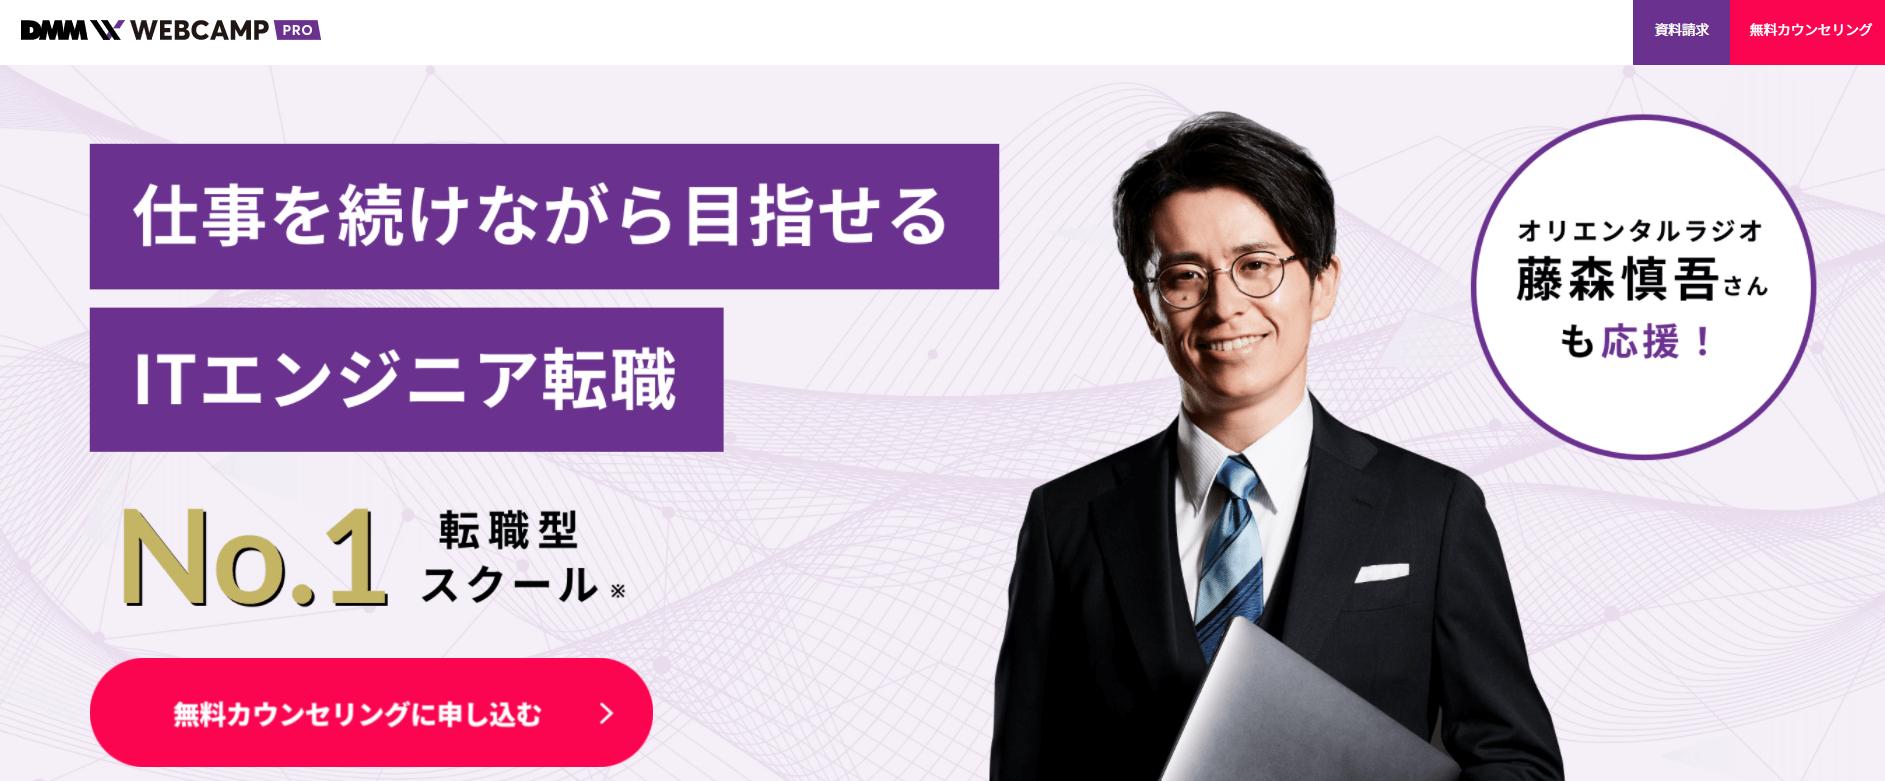 dmm_web_camp_評判_pro